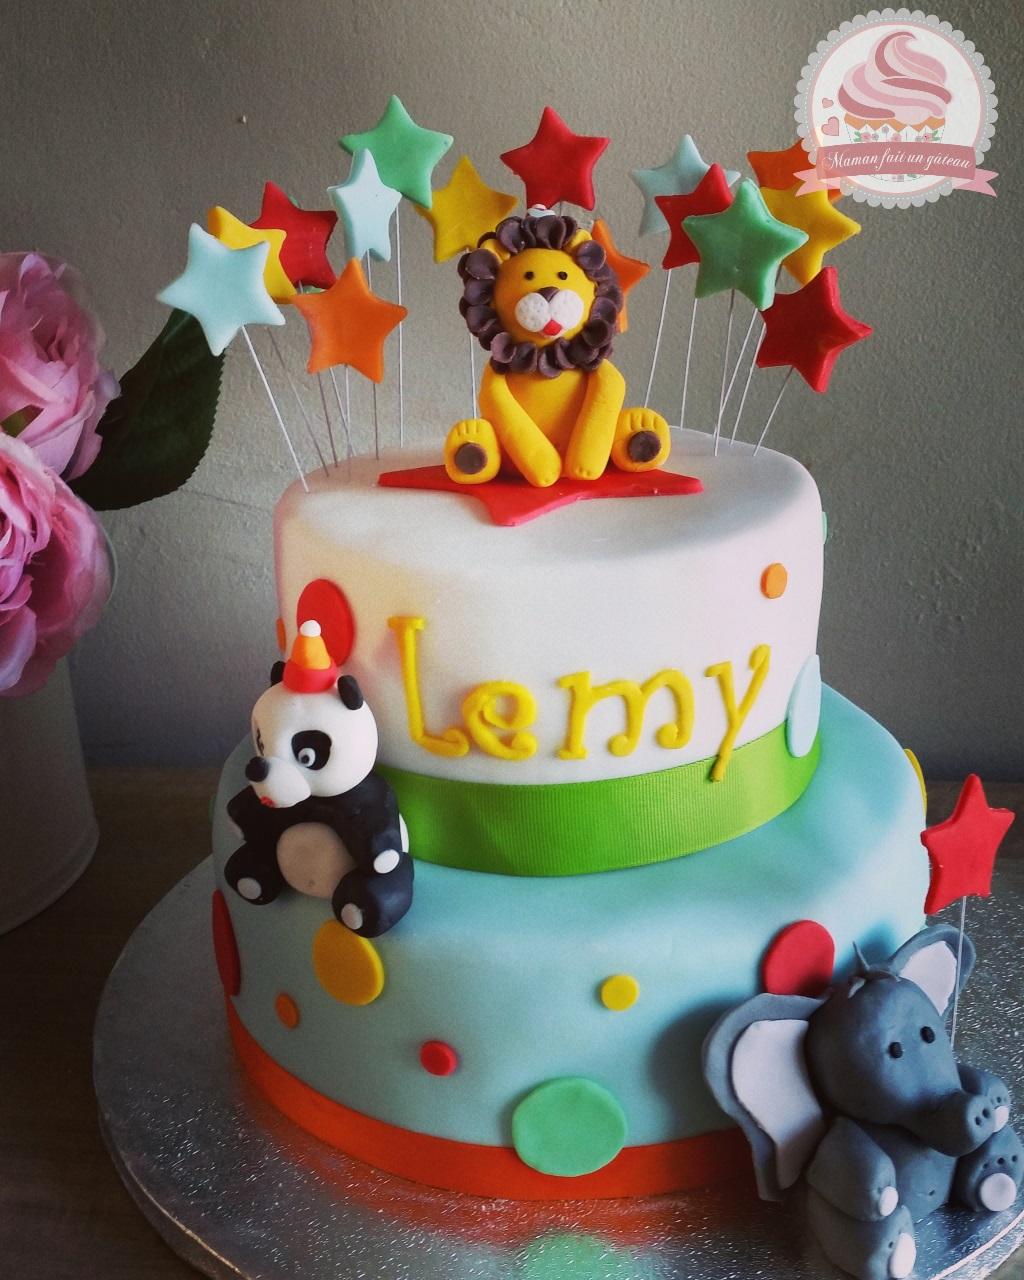 gateau-lemy-animaux-2